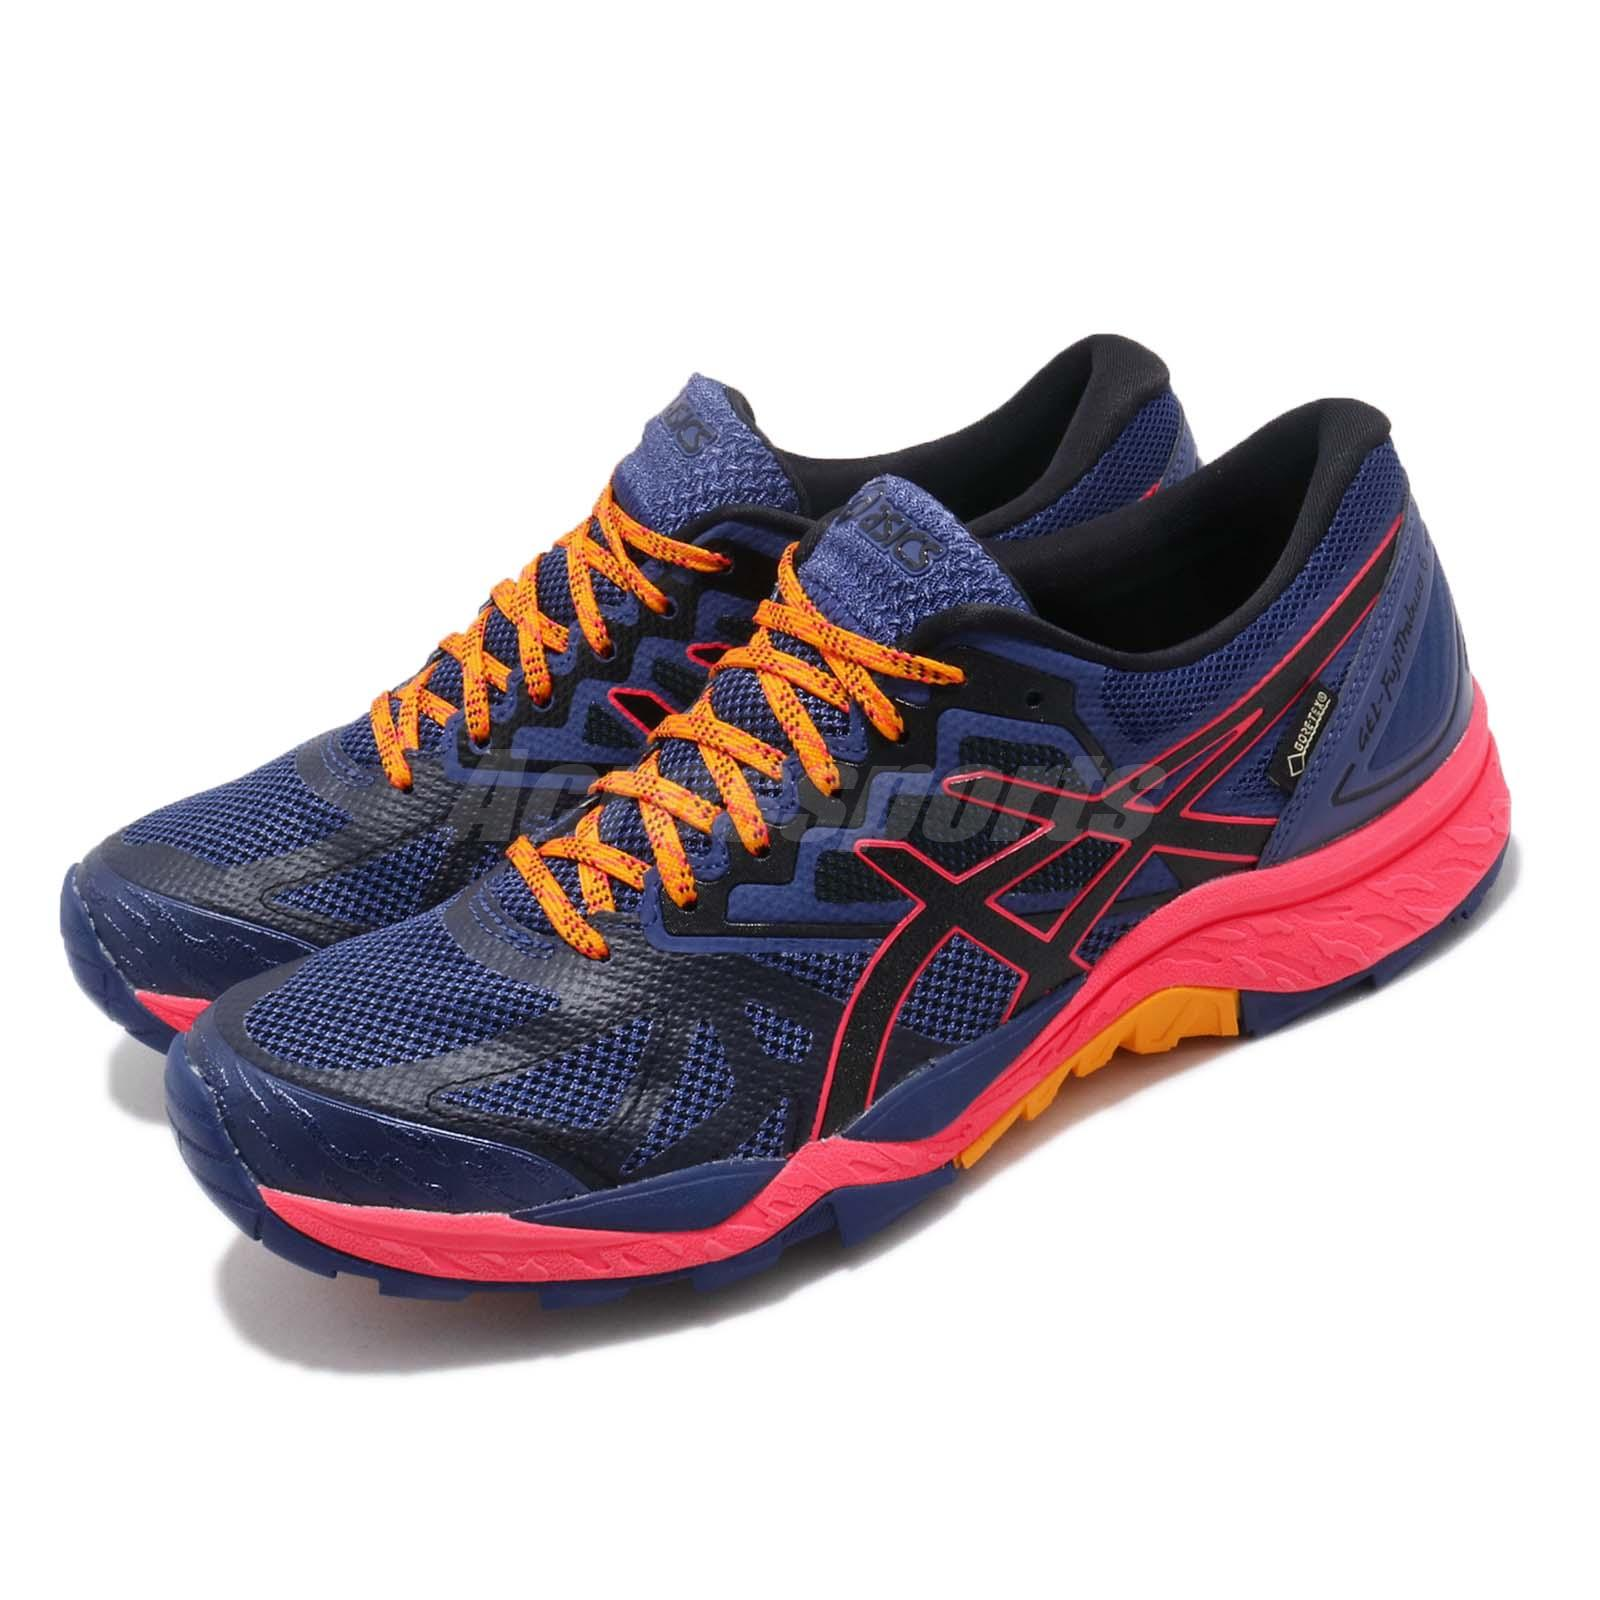 0105c980b05ce Details about Asics Gel-FujiTrabuco 6 G-TX Gore-Tex Blue Black Women  Running Shoes T7F5N-400